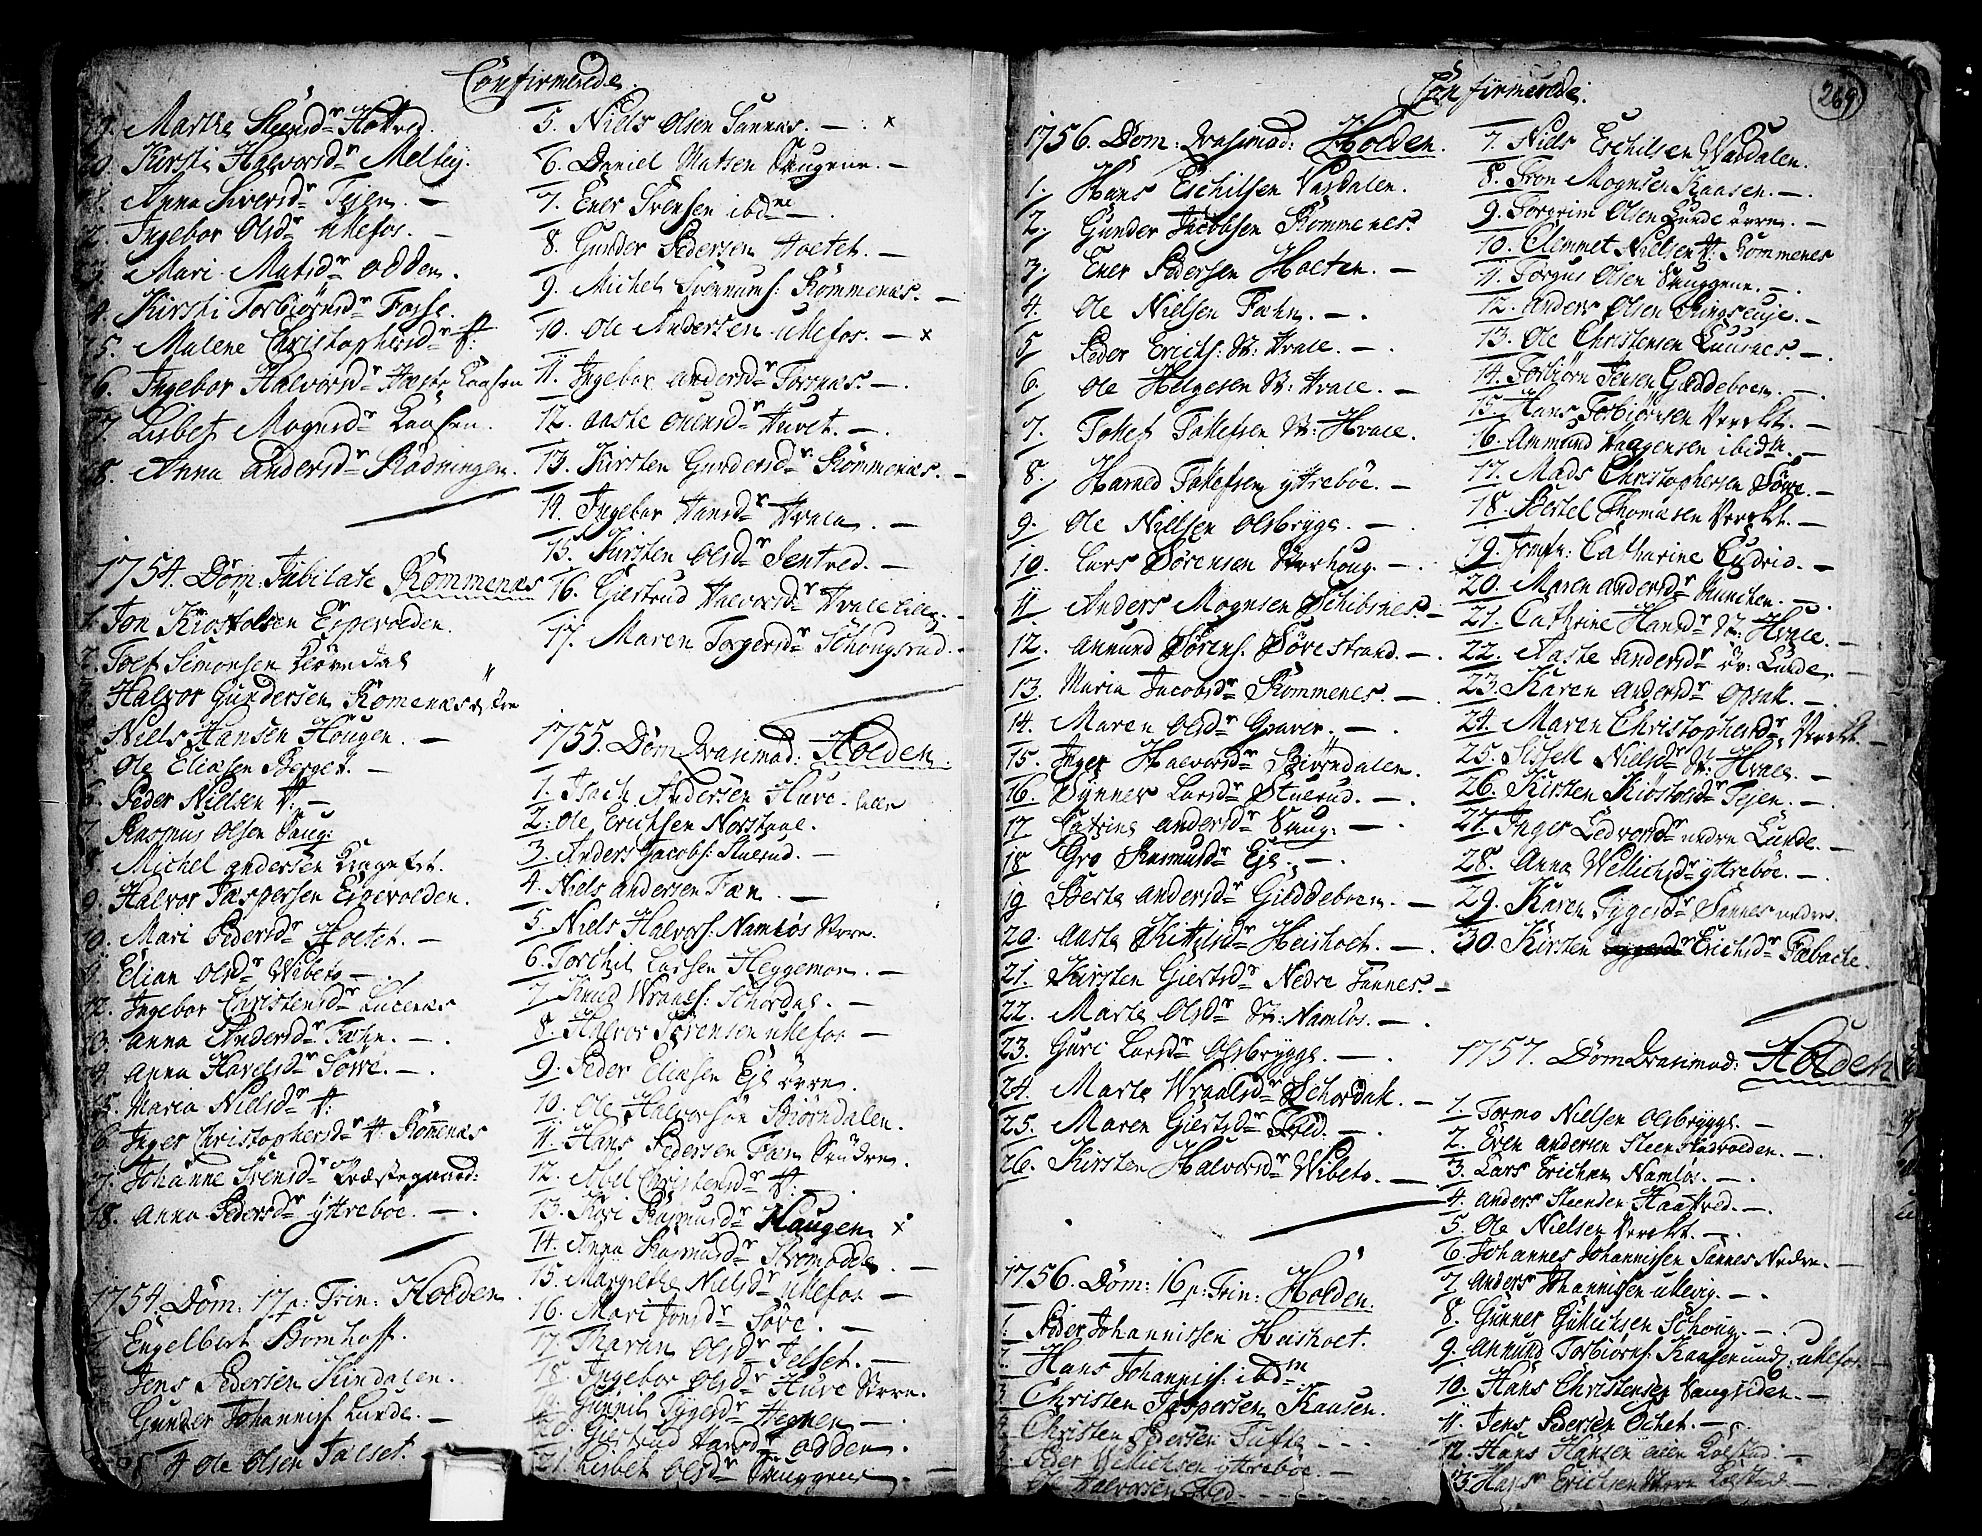 SAKO, Holla kirkebøker, F/Fa/L0001: Ministerialbok nr. 1, 1717-1779, s. 269